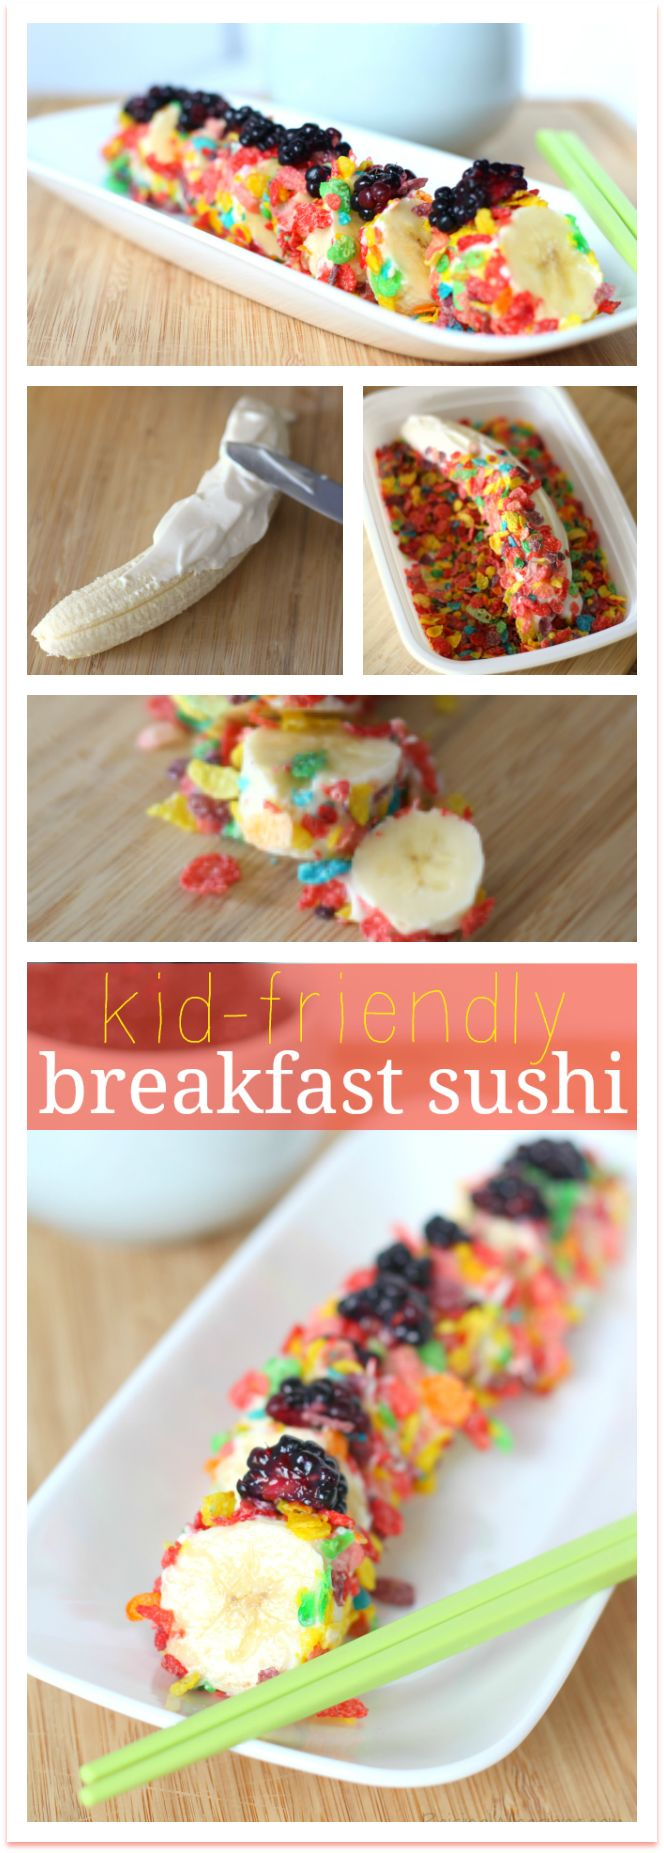 Kid Friendly Breakfast Sushi Recipe http://www.deal-shop.com/product/pure-body-naturals-beauty-dead-sea-mud-mask-for-facial-treatment-250g-8-8-fl-oz/